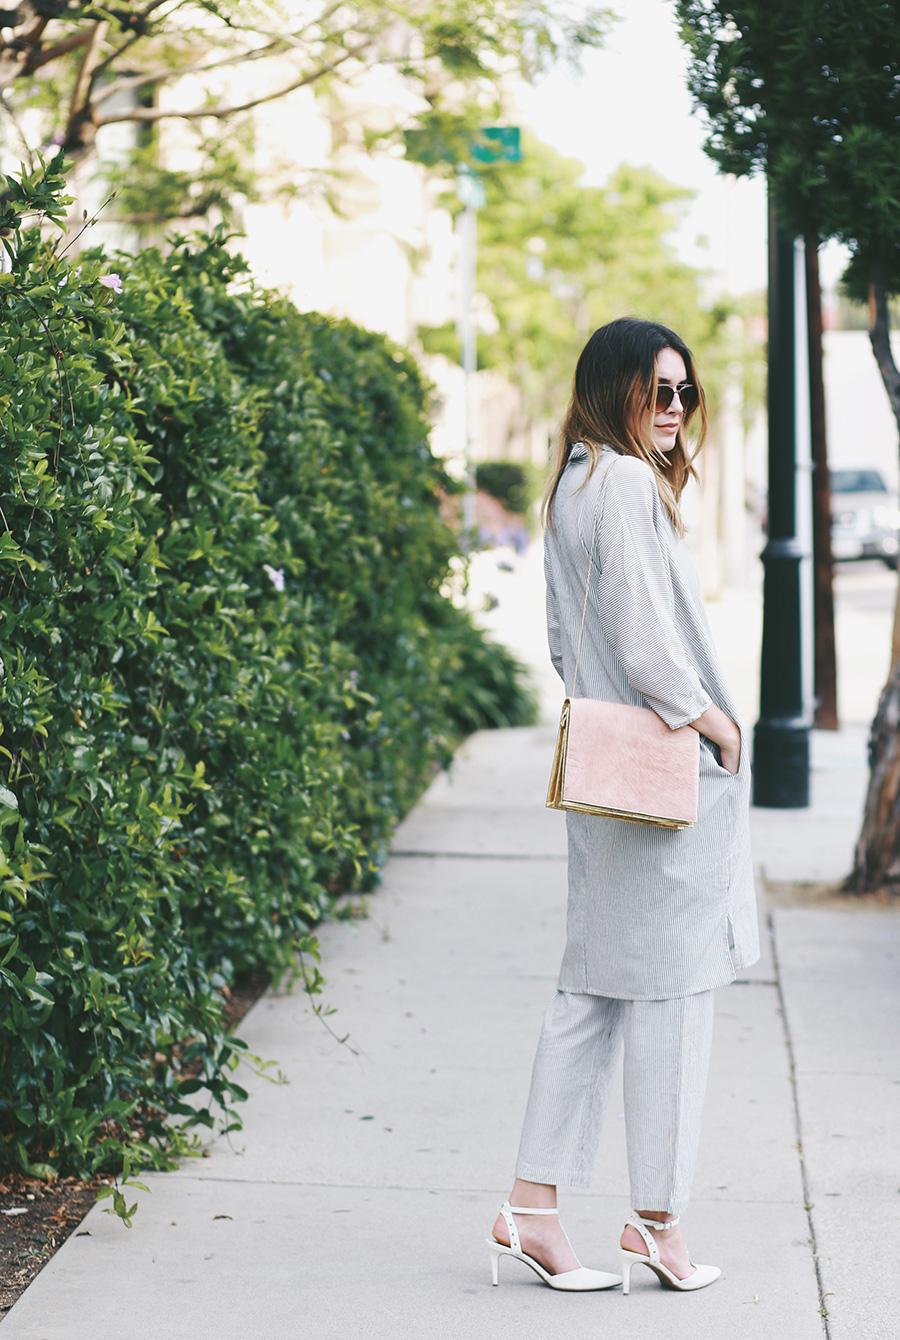 ganni blouse shirt and bag 6